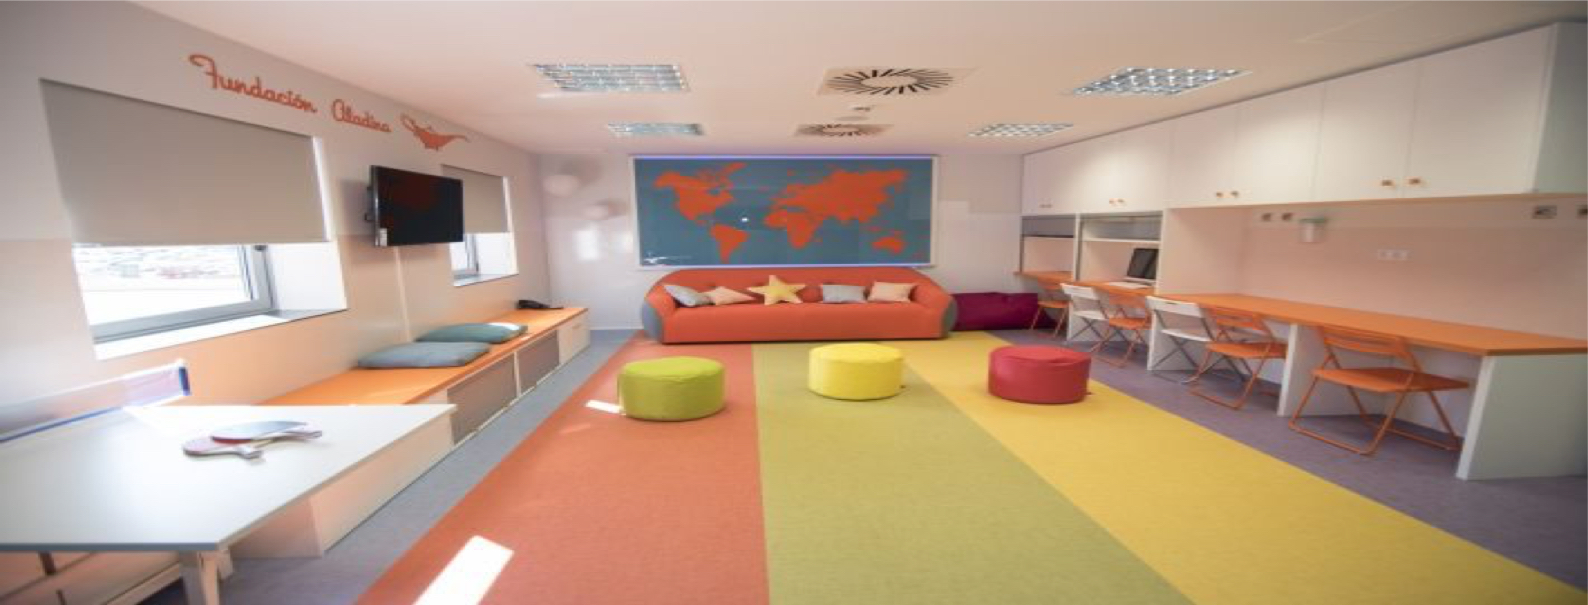 porcisan_aladina_Murcia-Sala-Adolescentes-710x440-710x440